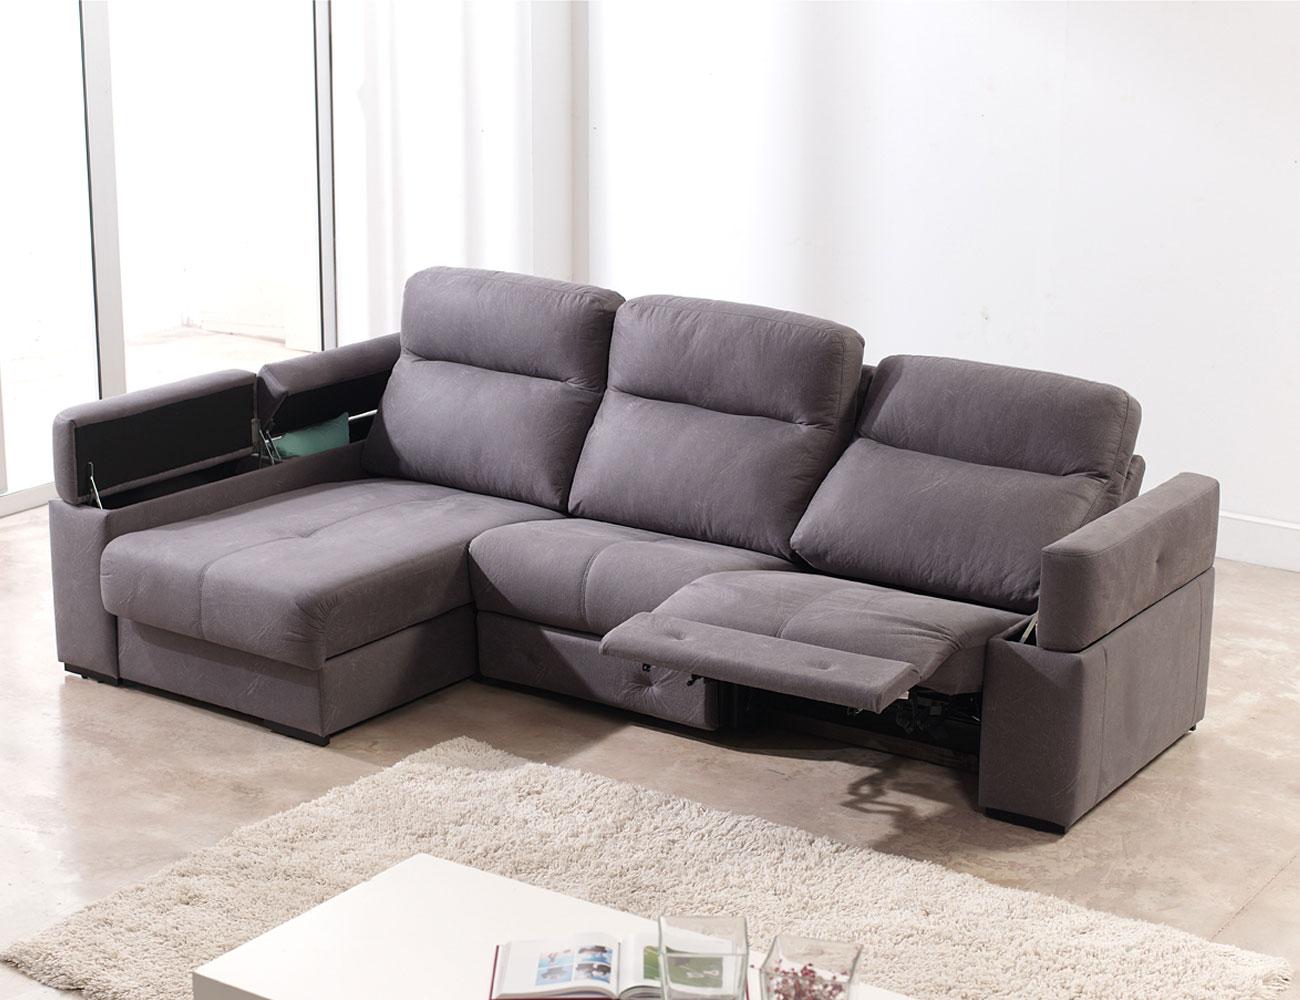 Sofa chaiselongue relax motor electrico 3 arcon 13